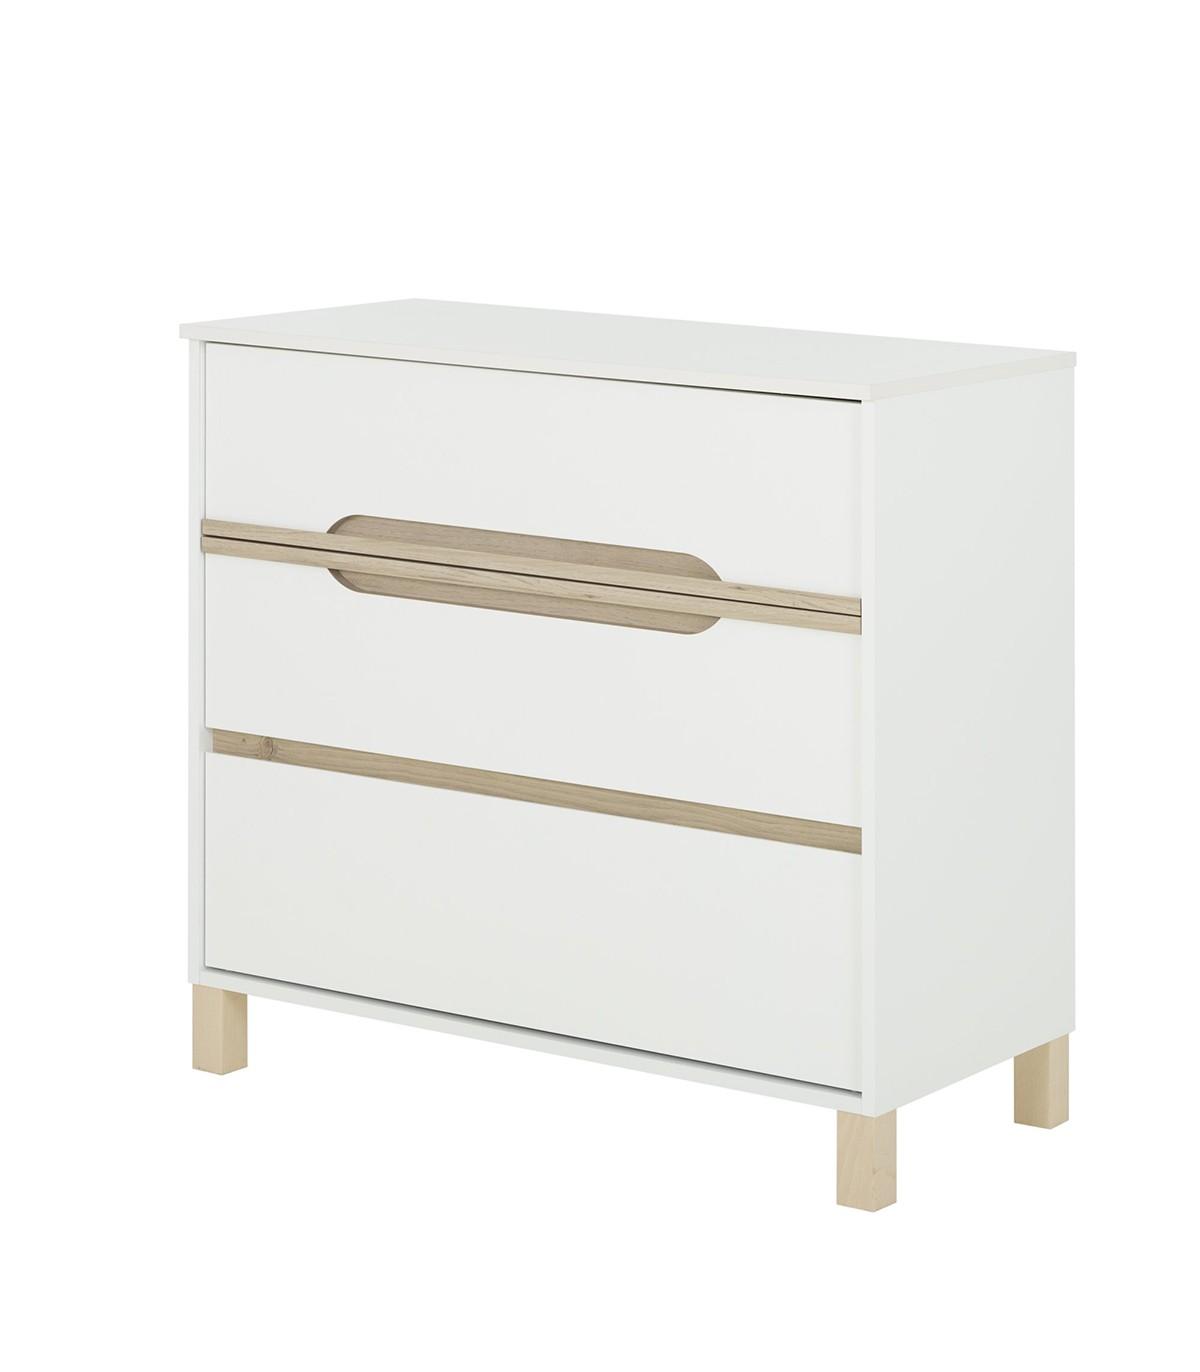 Commode 3 tiroirs blanche Enfant - 95 x H87 cm